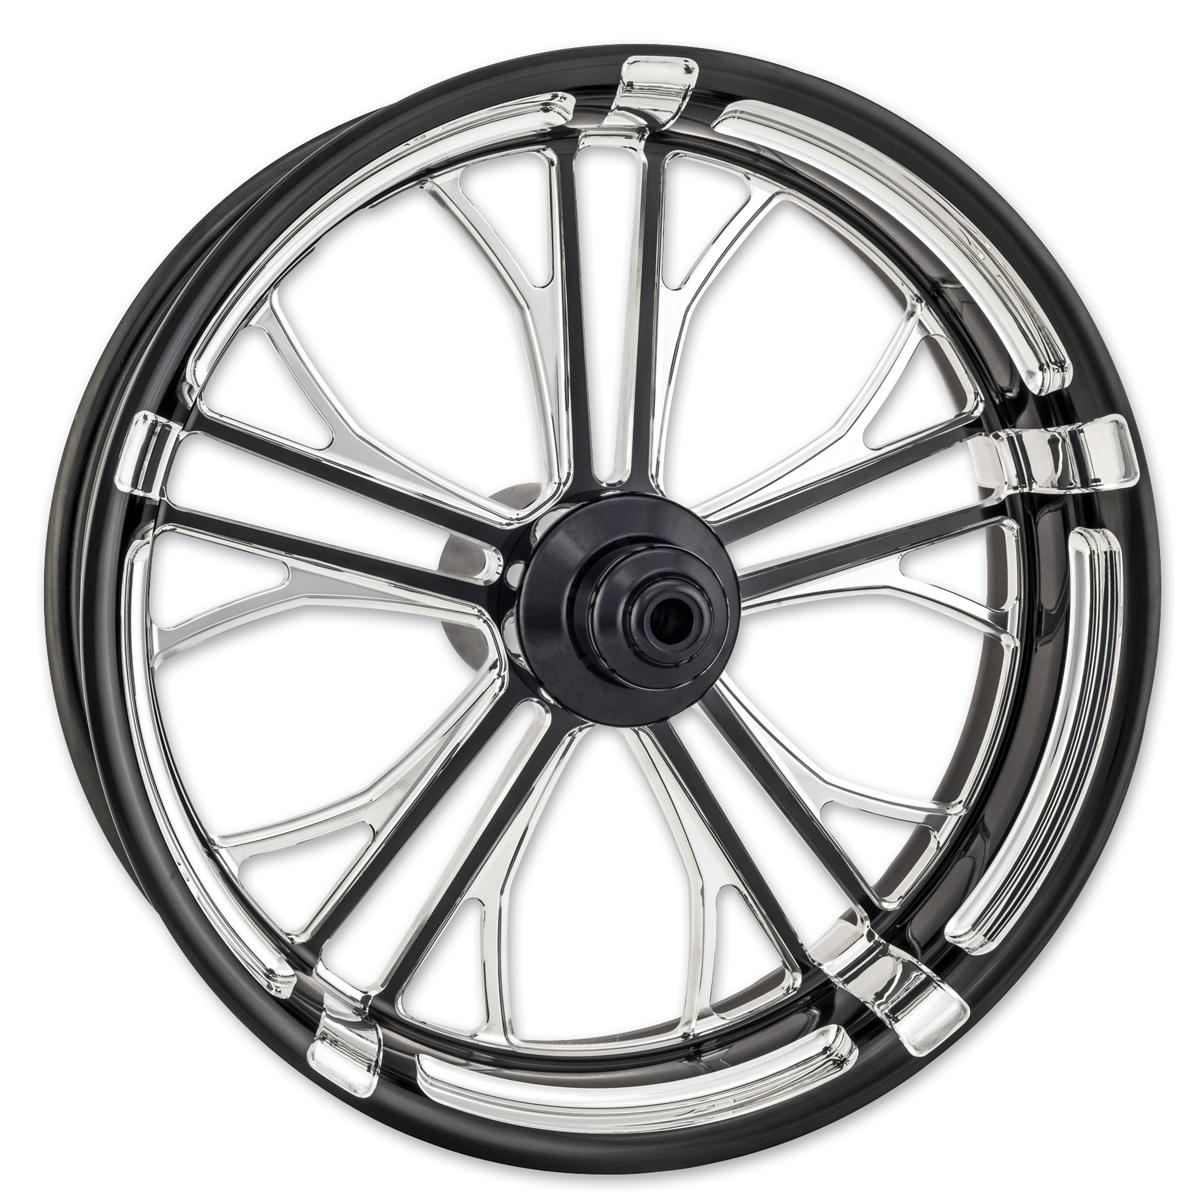 Performance Machine Dixon Platinum Cut Front Wheel 21x3.5 Dual disc